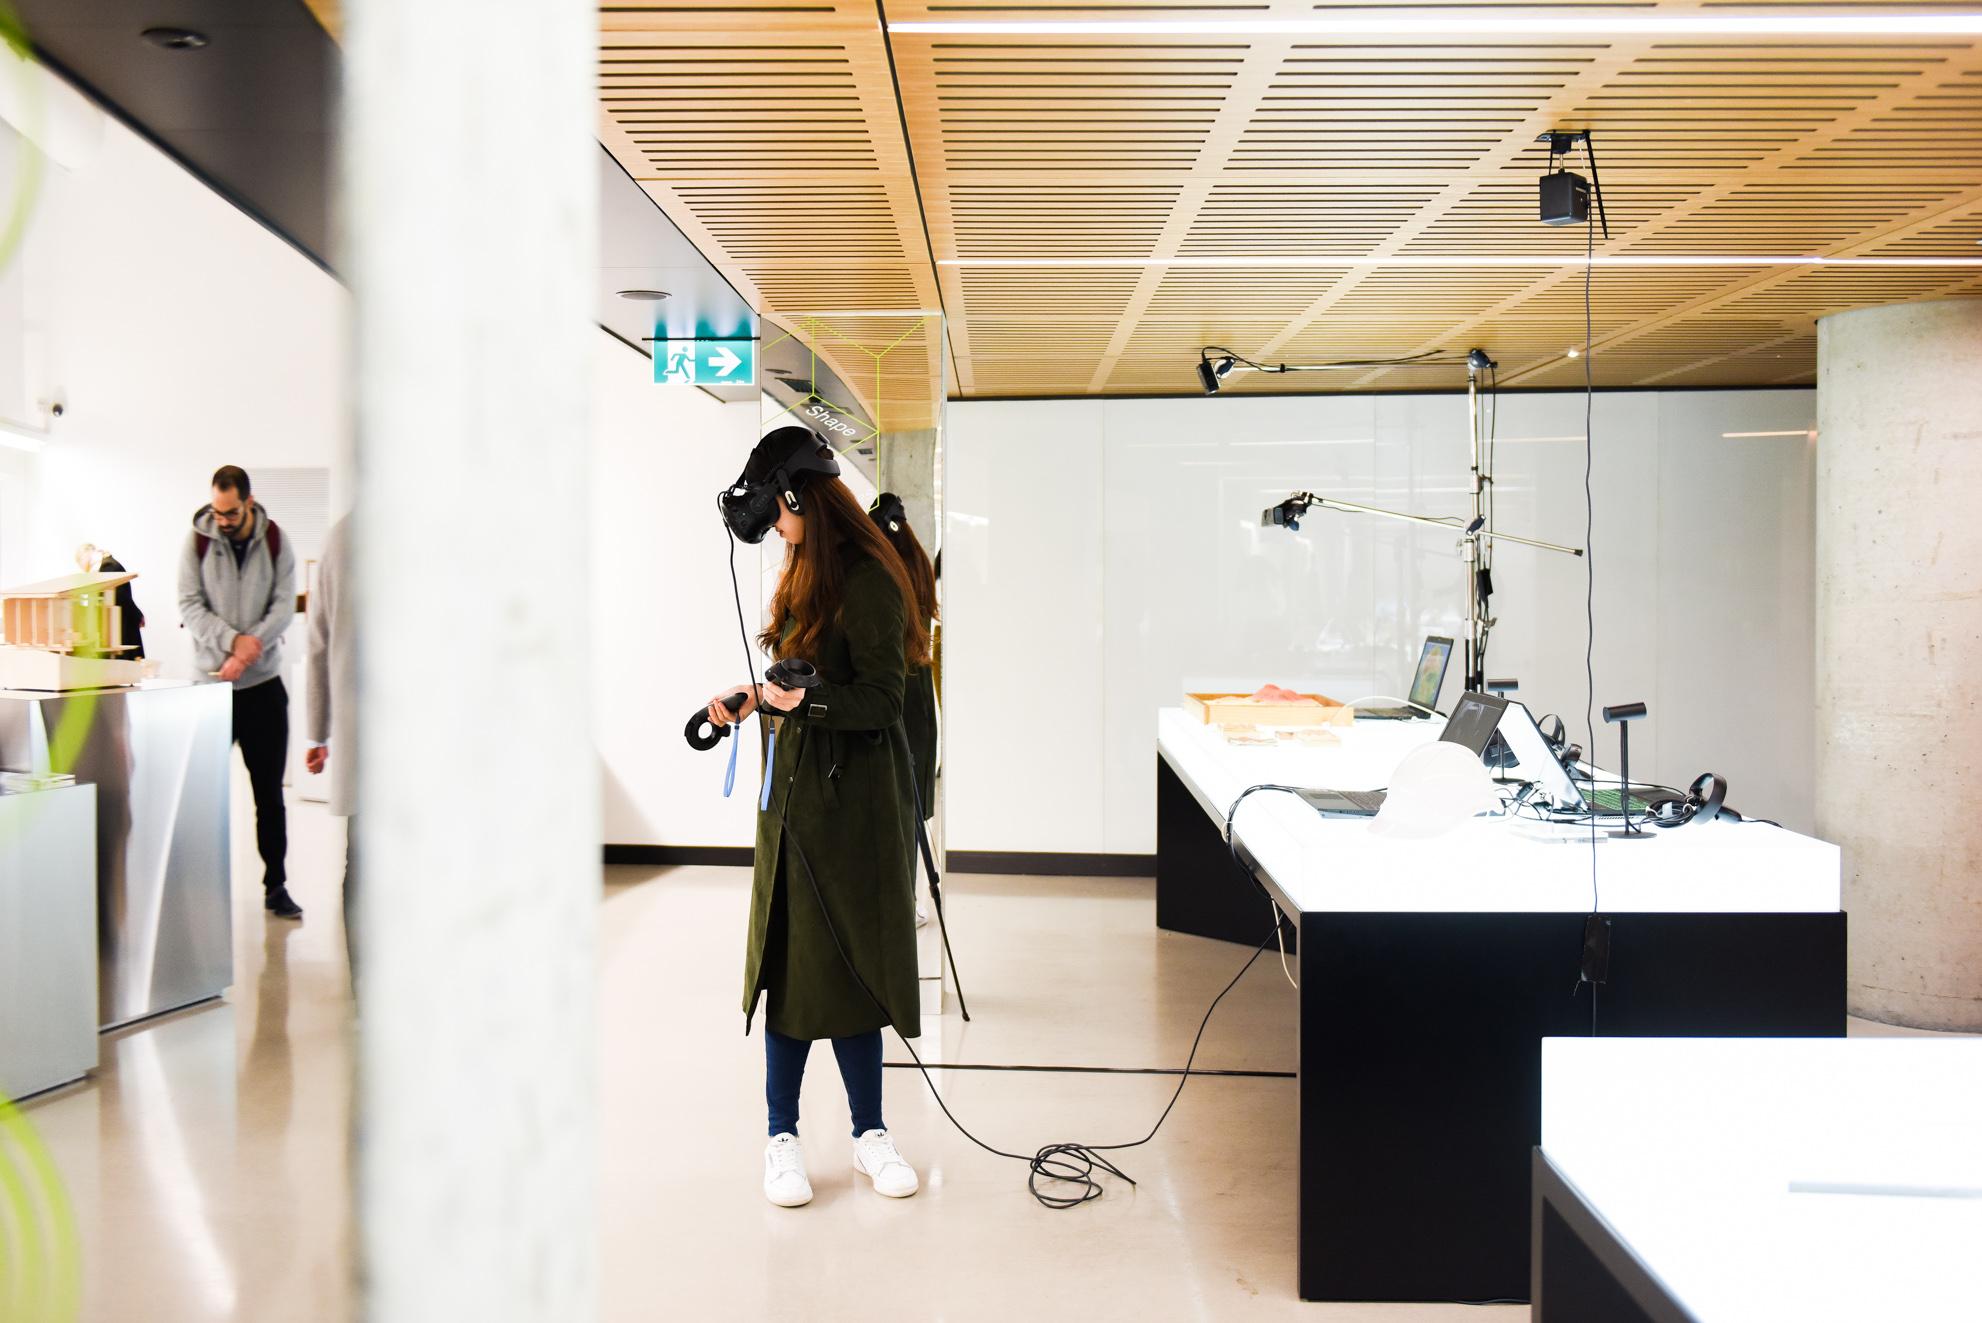 Virtual Reality Oculus Rift VR Headset & Unreal Engine 4